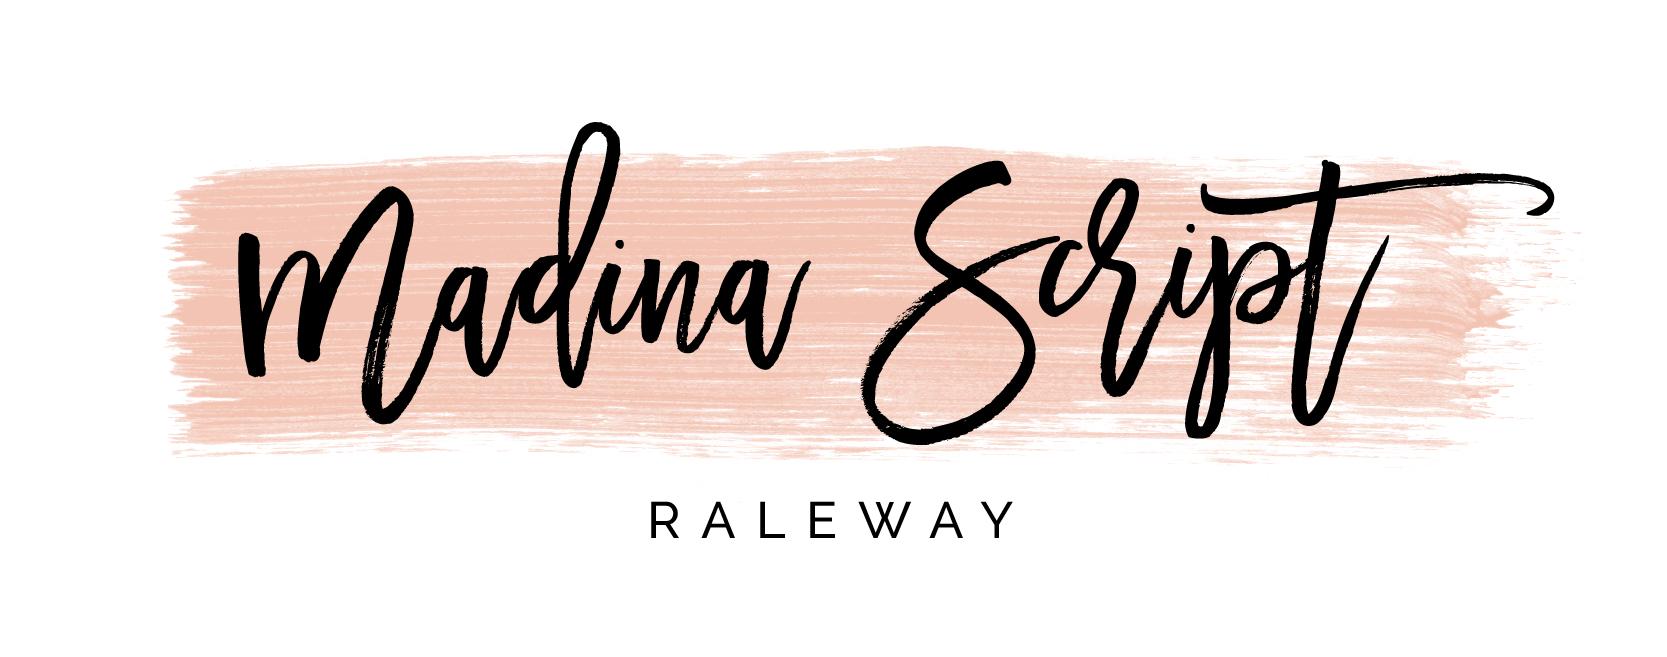 Madina Script – Top Brush Fonts and Font Pairings